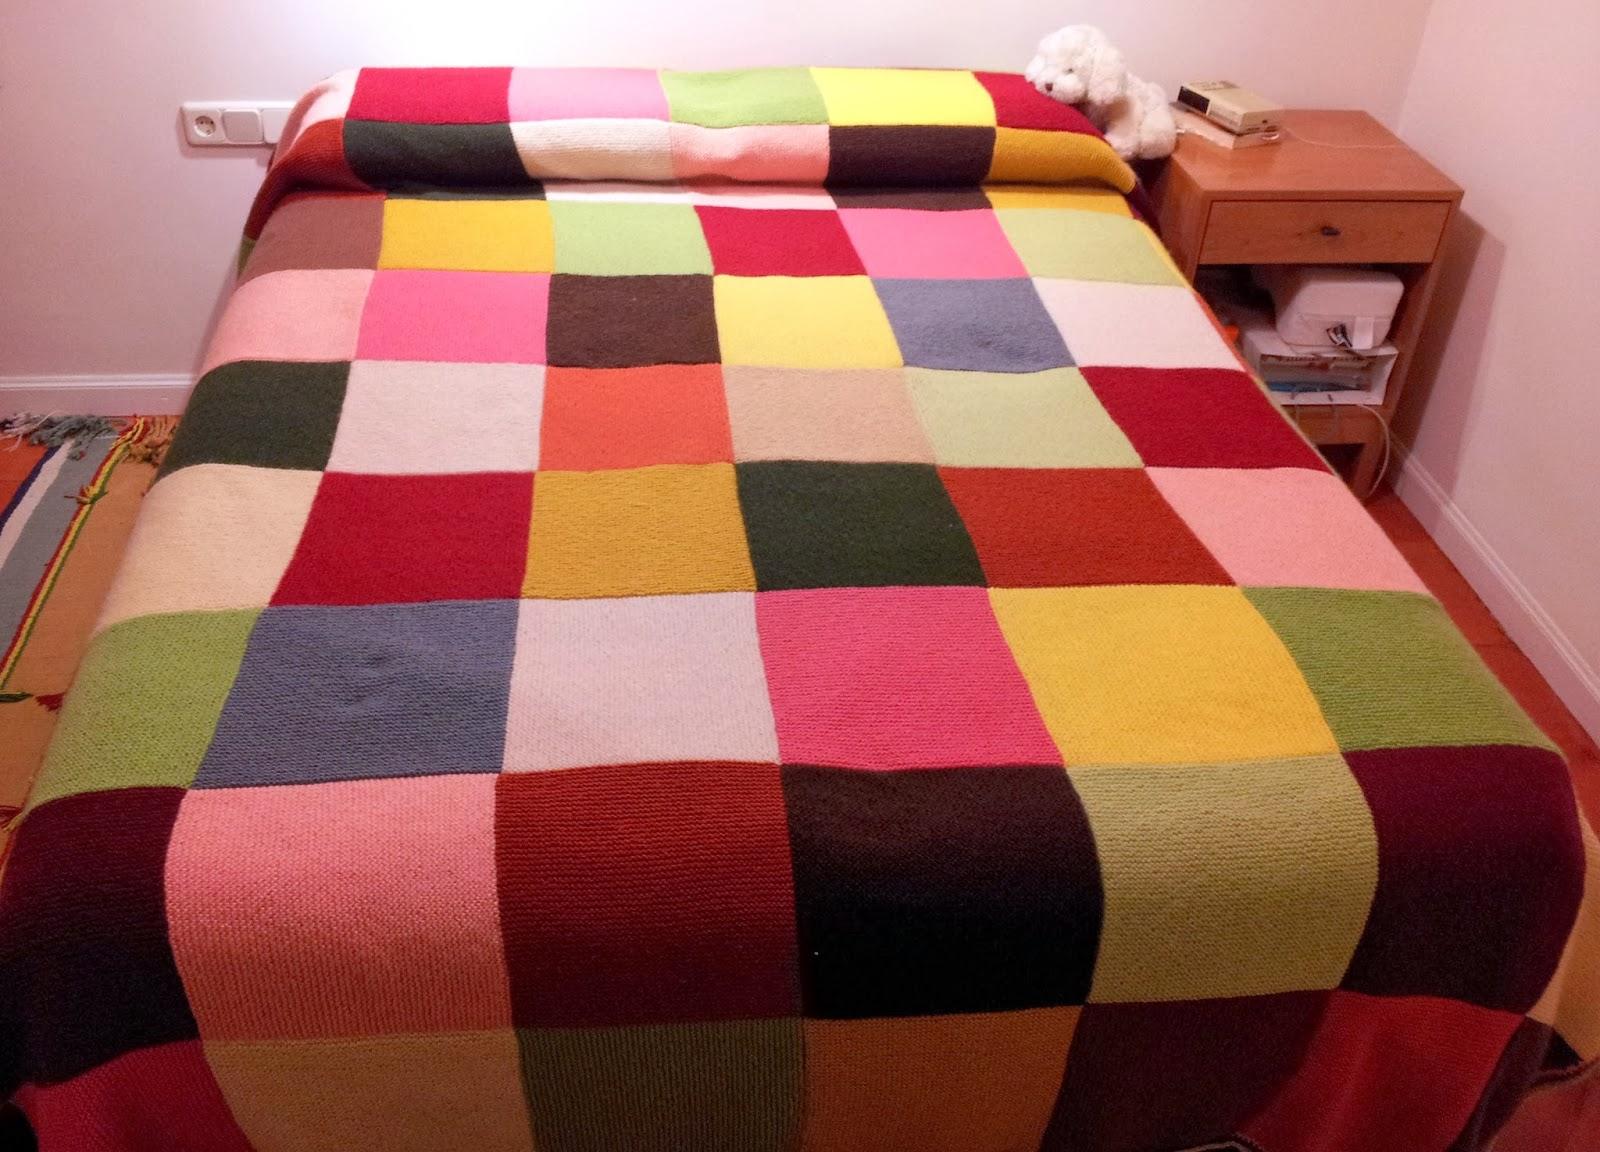 Mantas sof creciendoentreflores for Mantas de lana hechas a mano